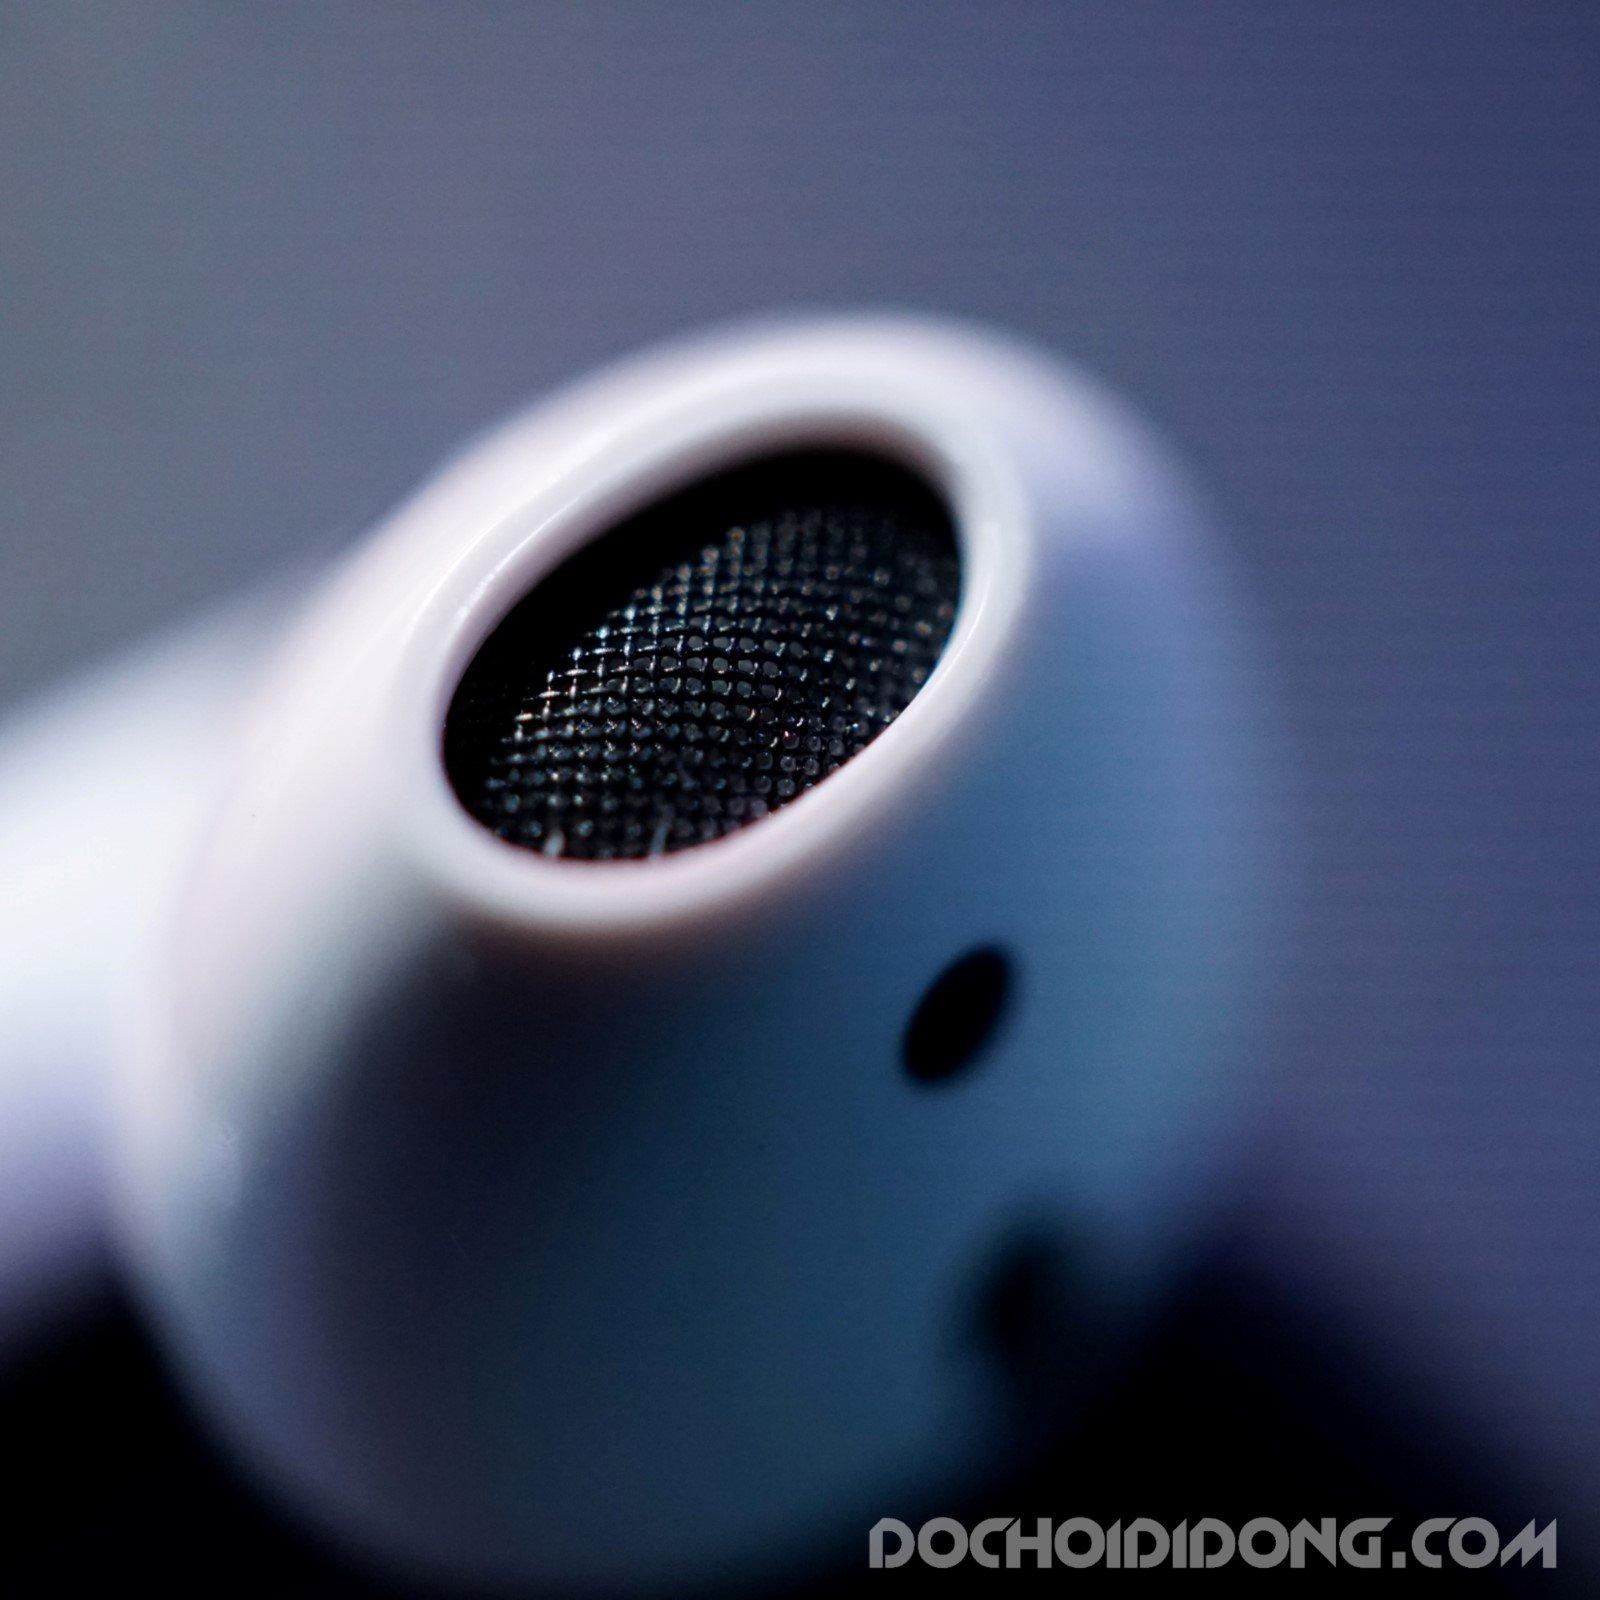 tai-nghe-airpod-coteetci-bat-nap-tu-ket-noi-iphone